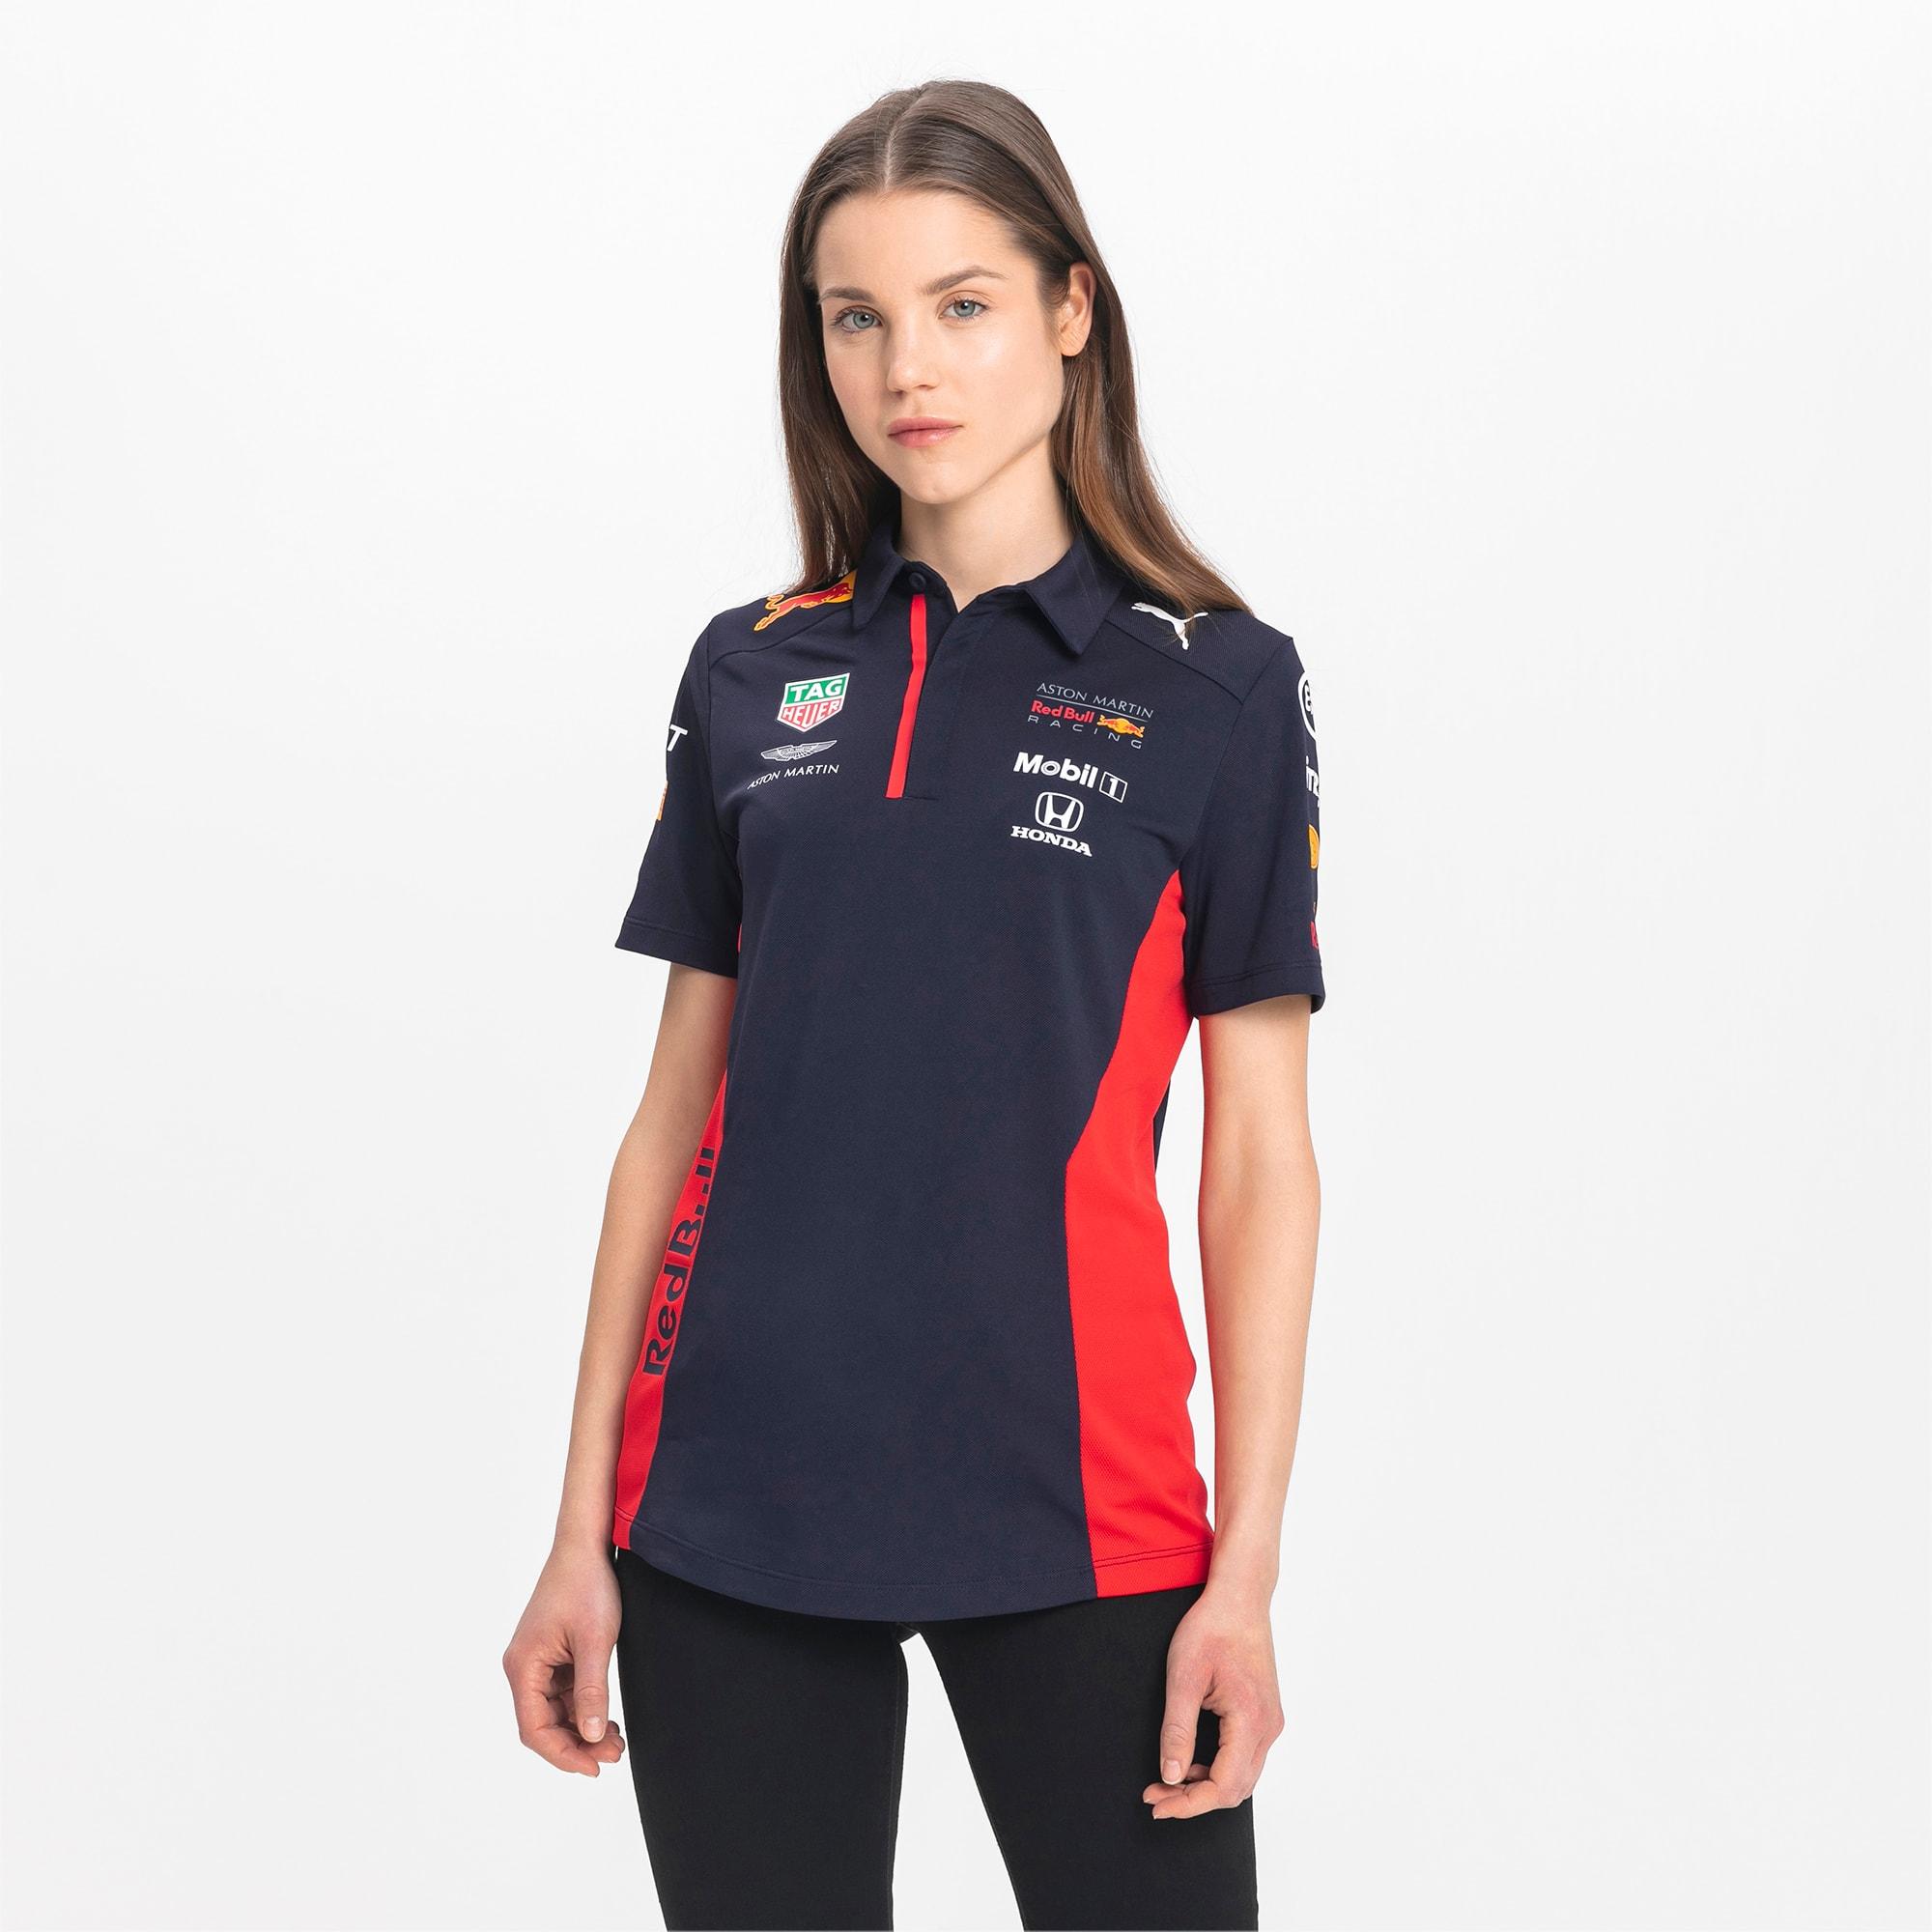 Red Bull Racing Team Women's Polo | NIGHT